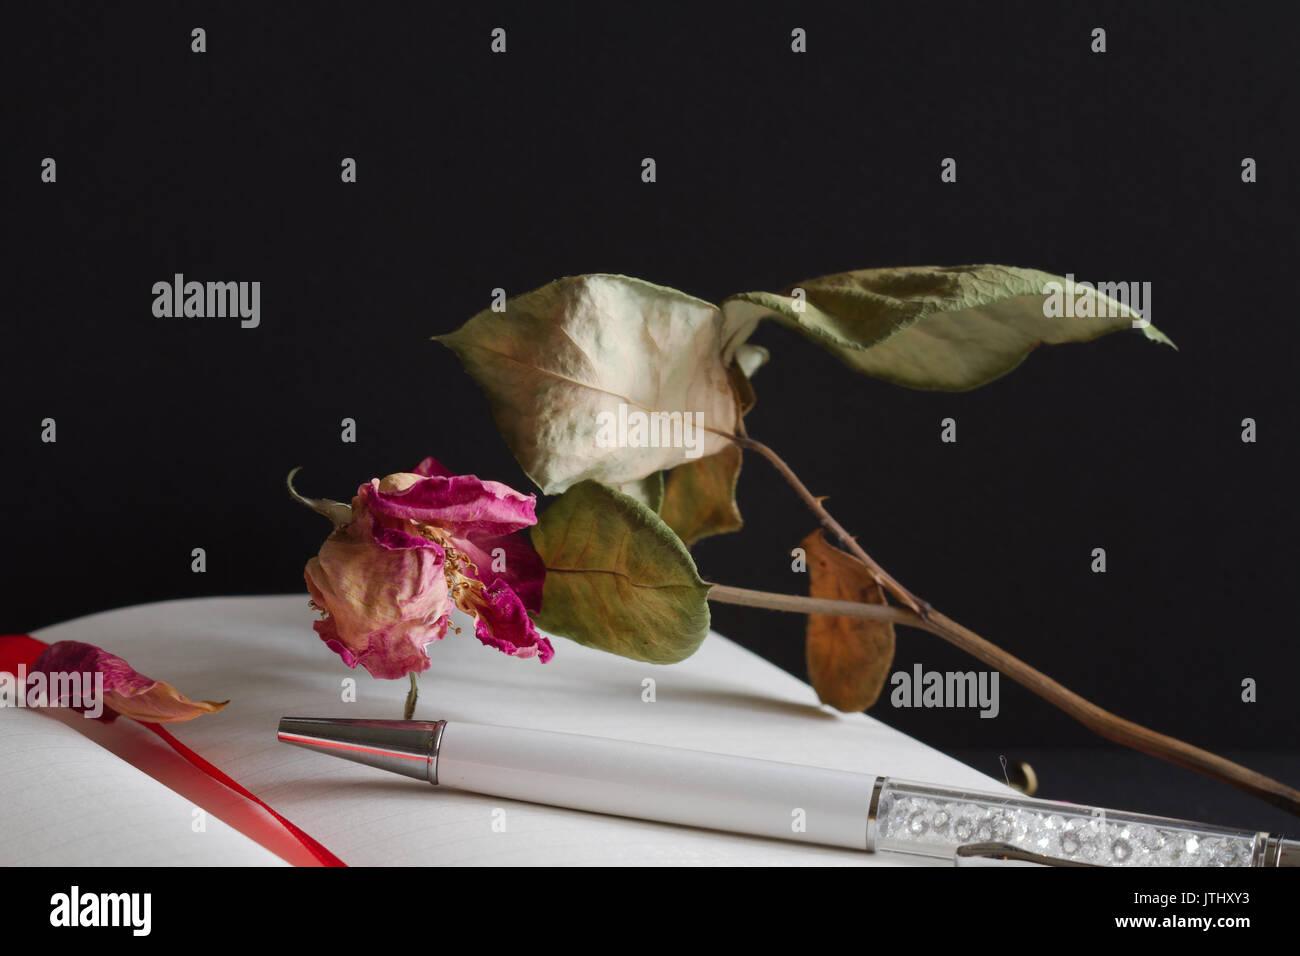 Journal, Pen & Dead Rose - Macro Stock Photo